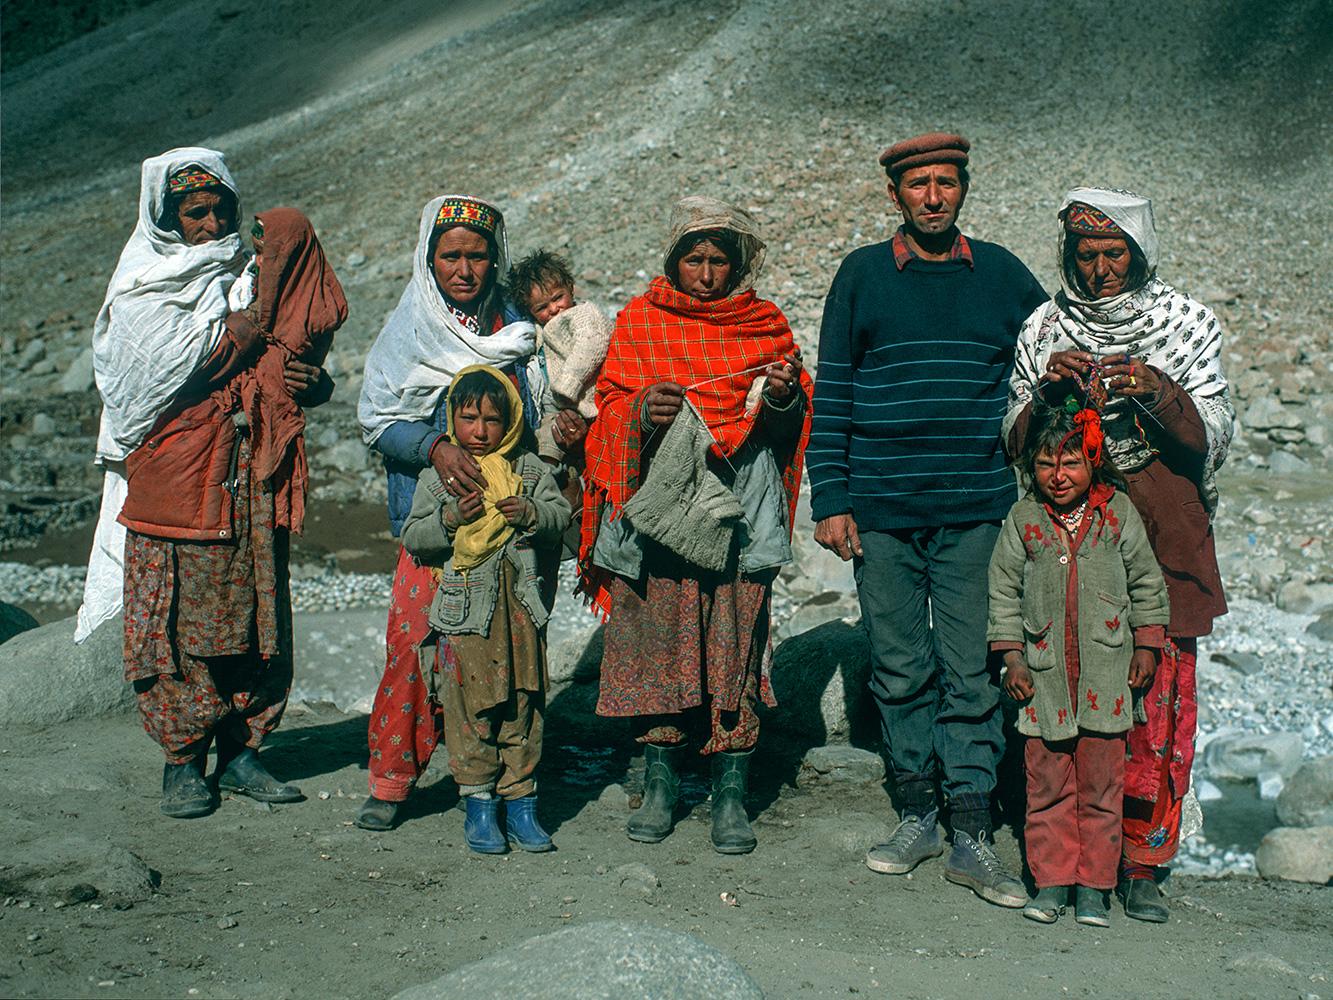 At Shuwert, on the Shimshal Pass